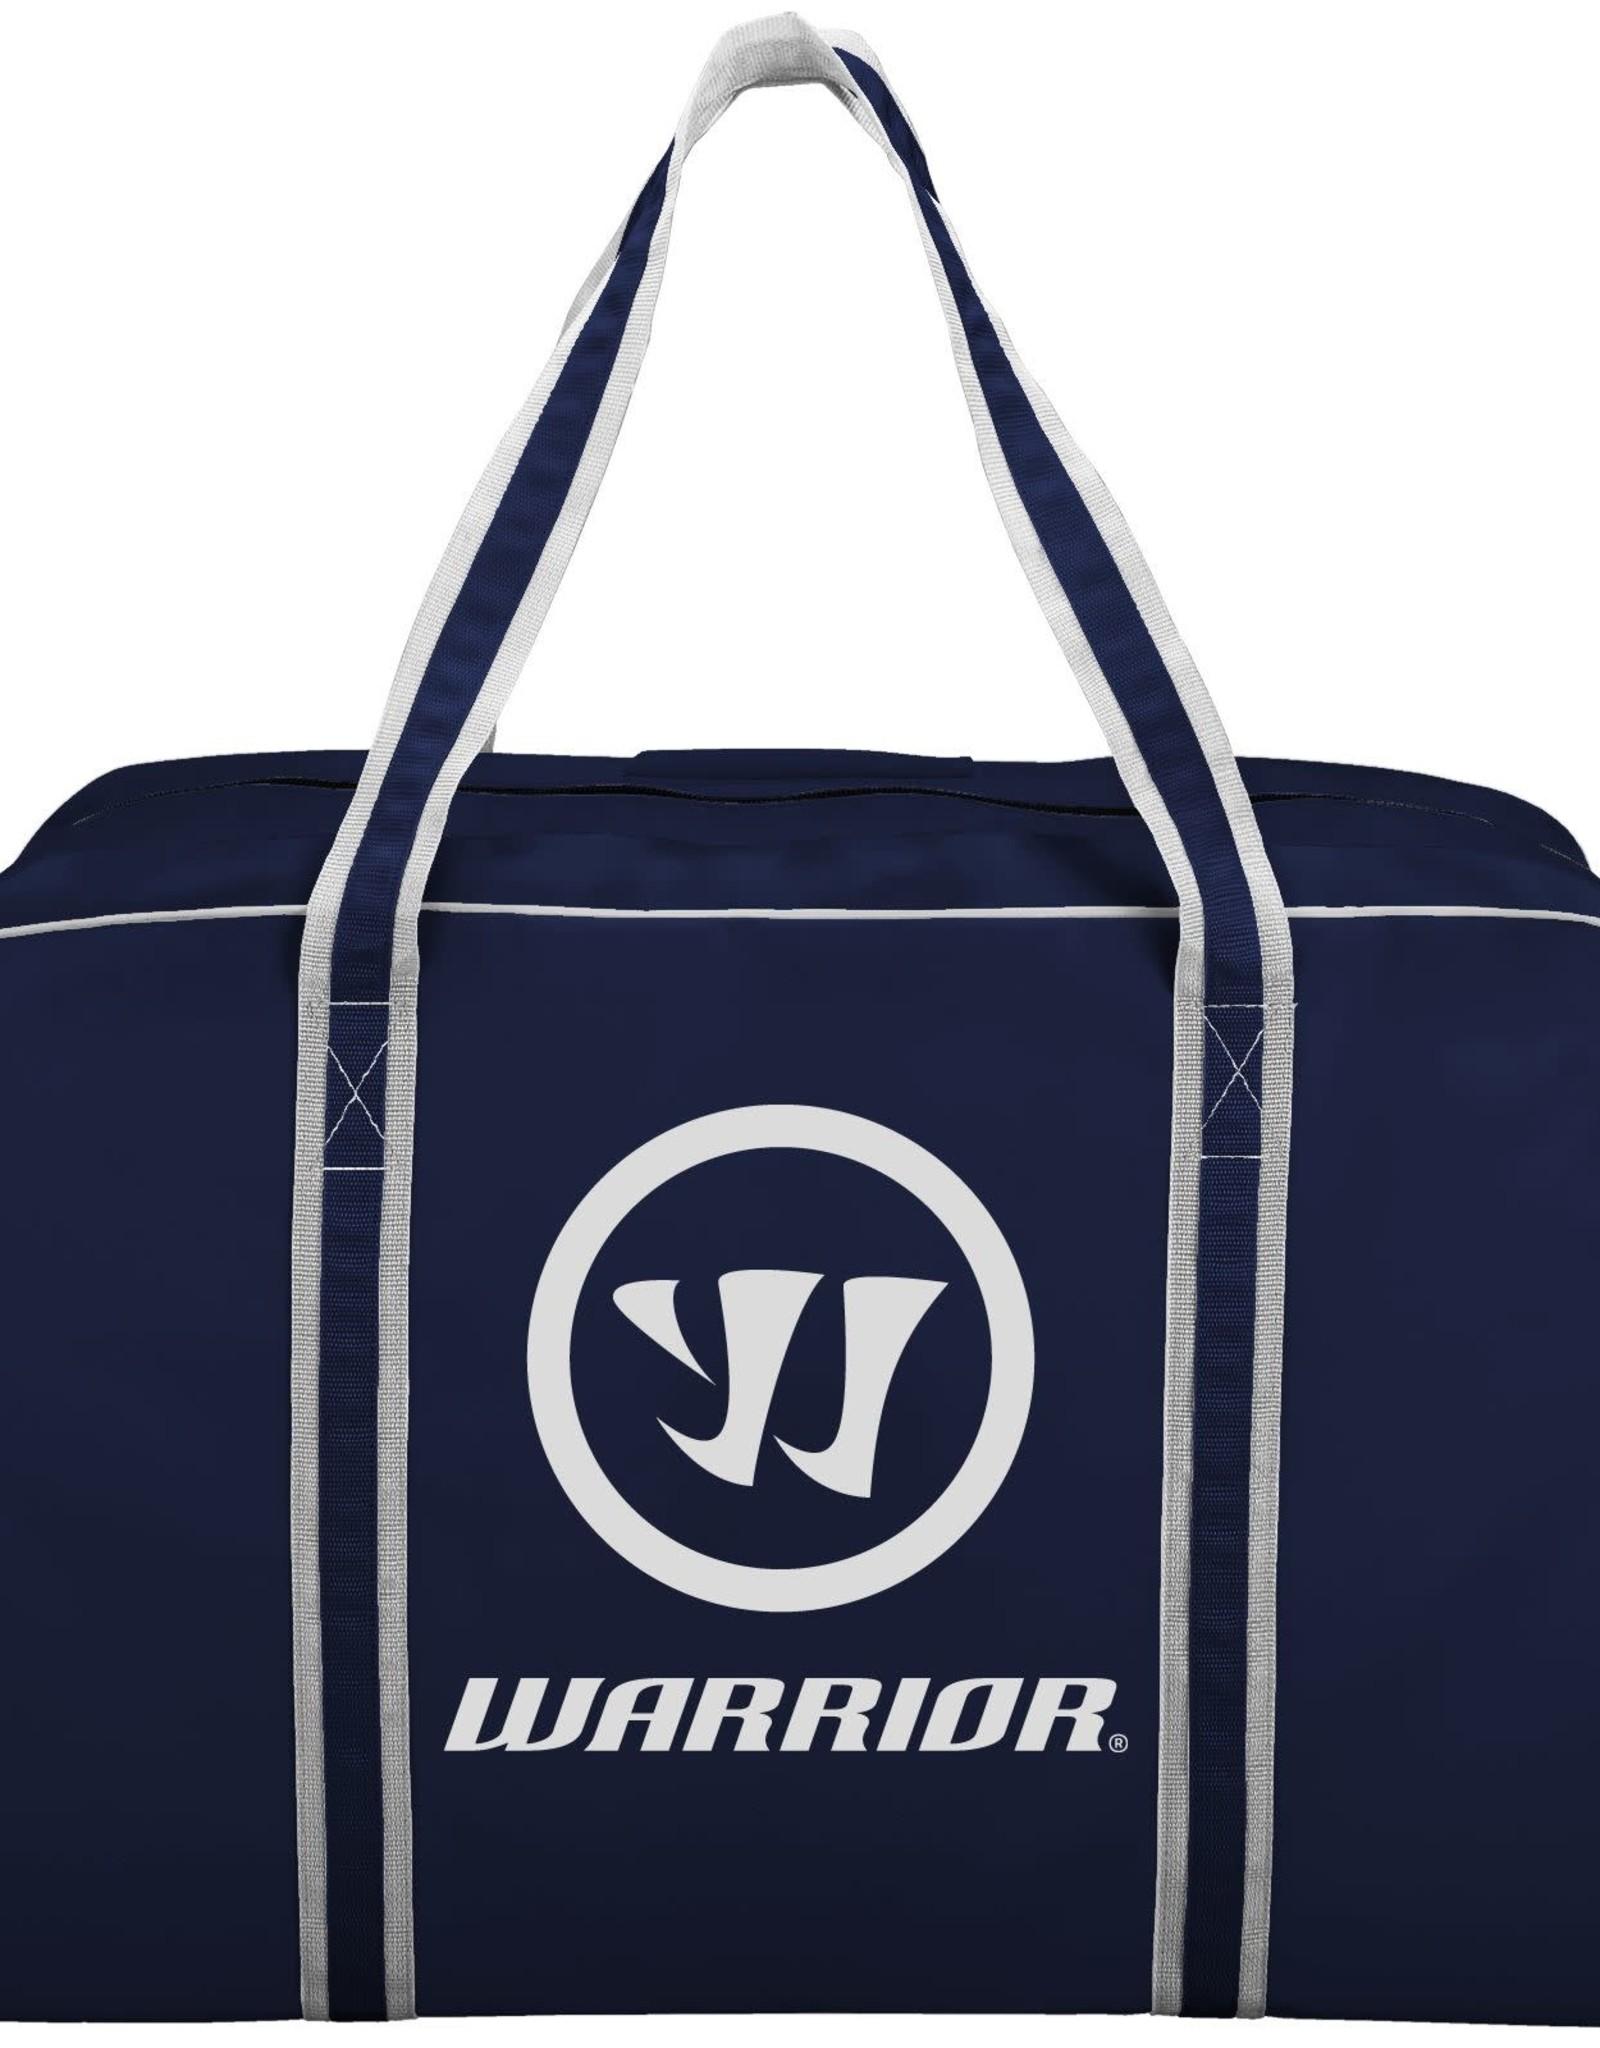 Warrior St. Peters Warrior Pro Bag (Large)